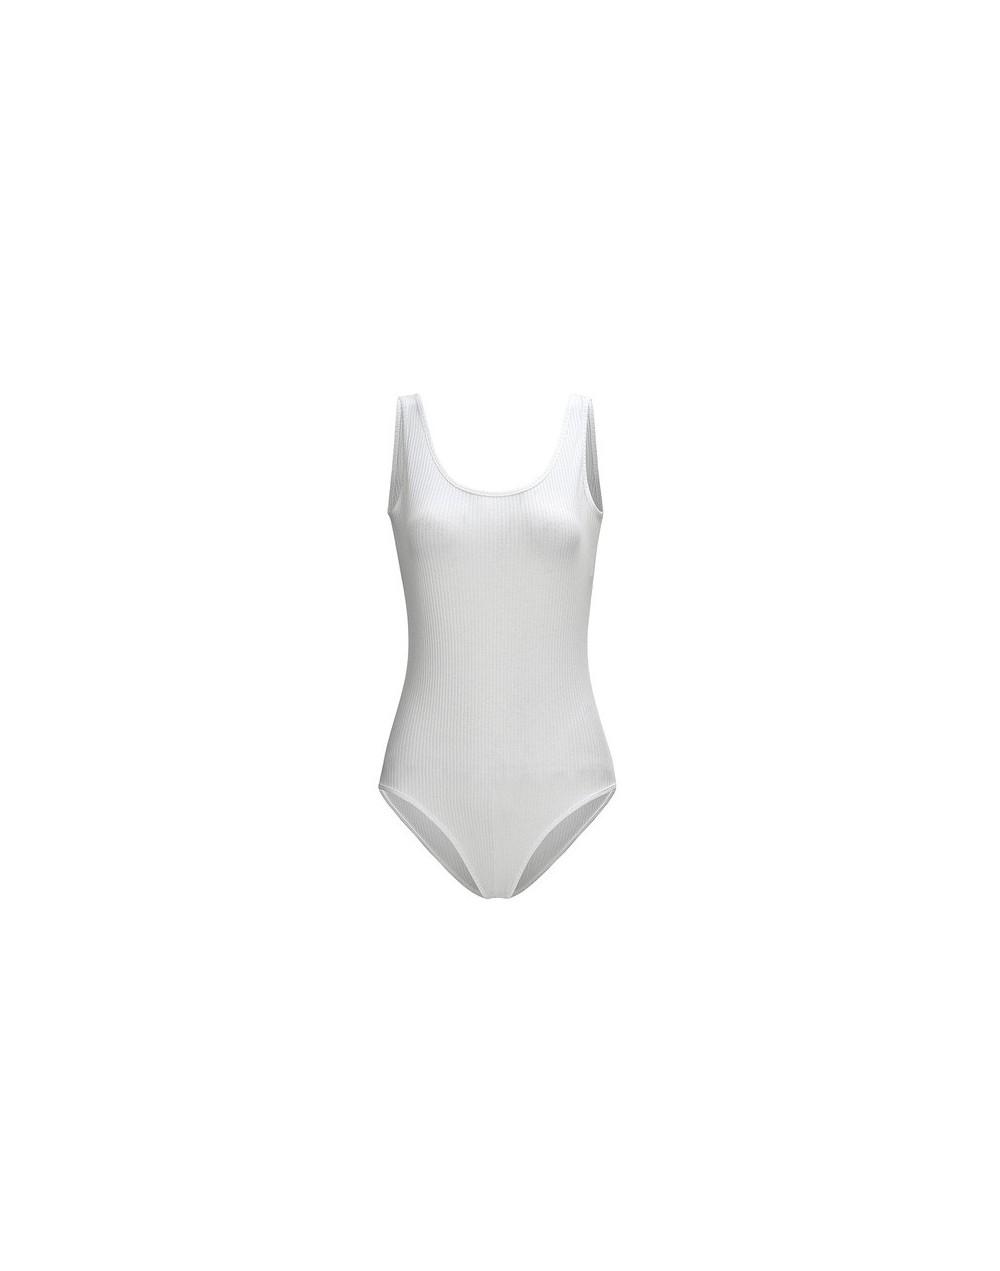 2019 New Fashion Black Bodysuit Women Elegant Sexy Body Spaghetti Strap Bodycon Jumpsuit Romper 2019 Summer Short - White - ...